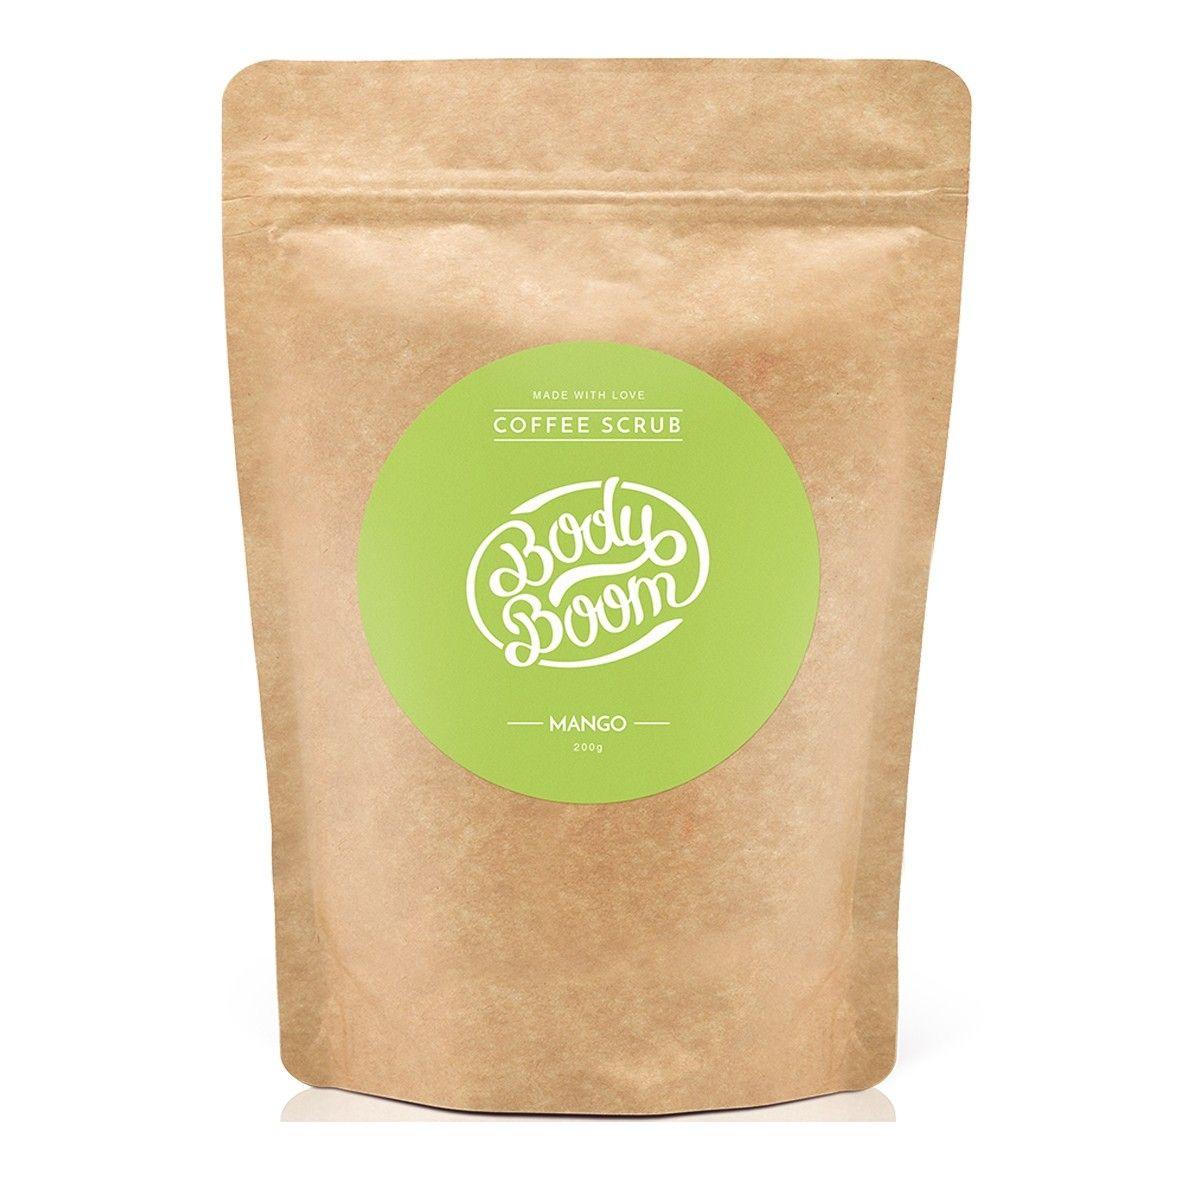 Afbeelding van Bodyboom Coffee Scrub Mango Bodyscrub Beauty